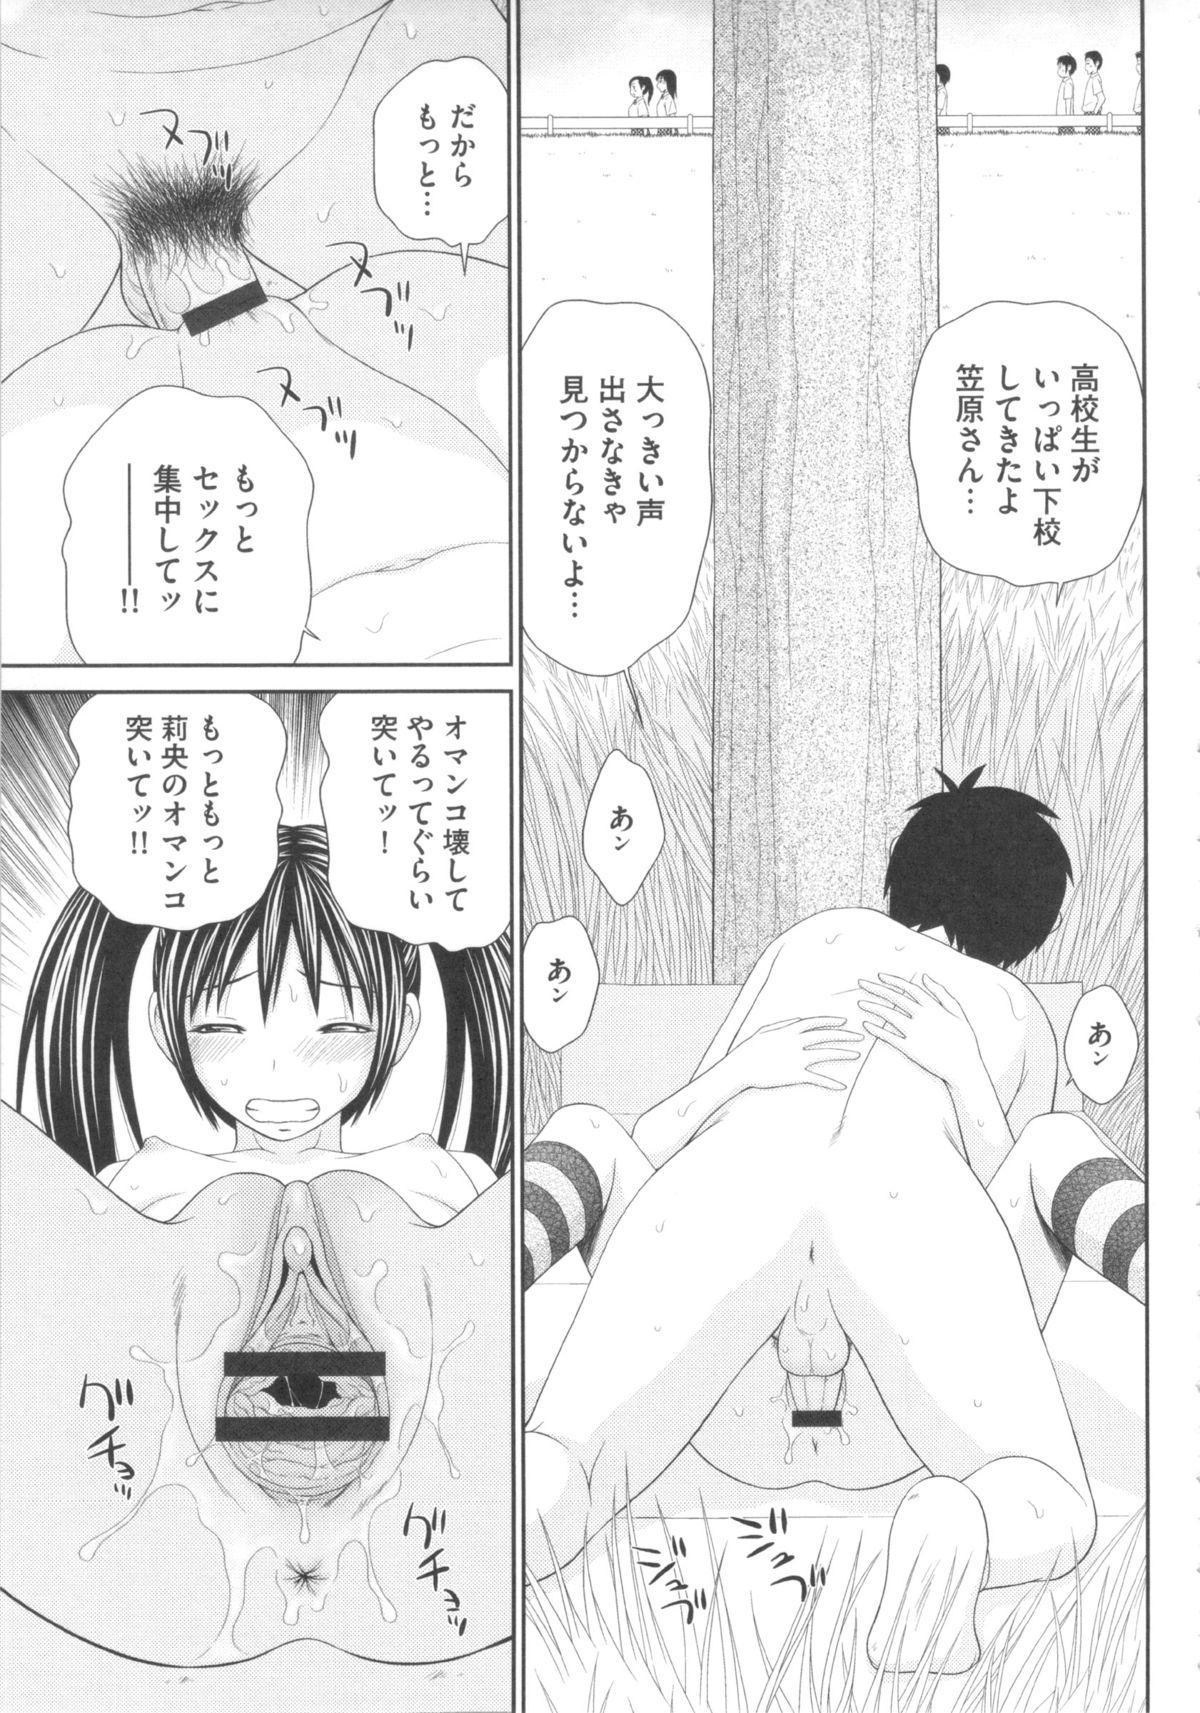 Kiseki No Zaajiru - Sperm of Miracle 139